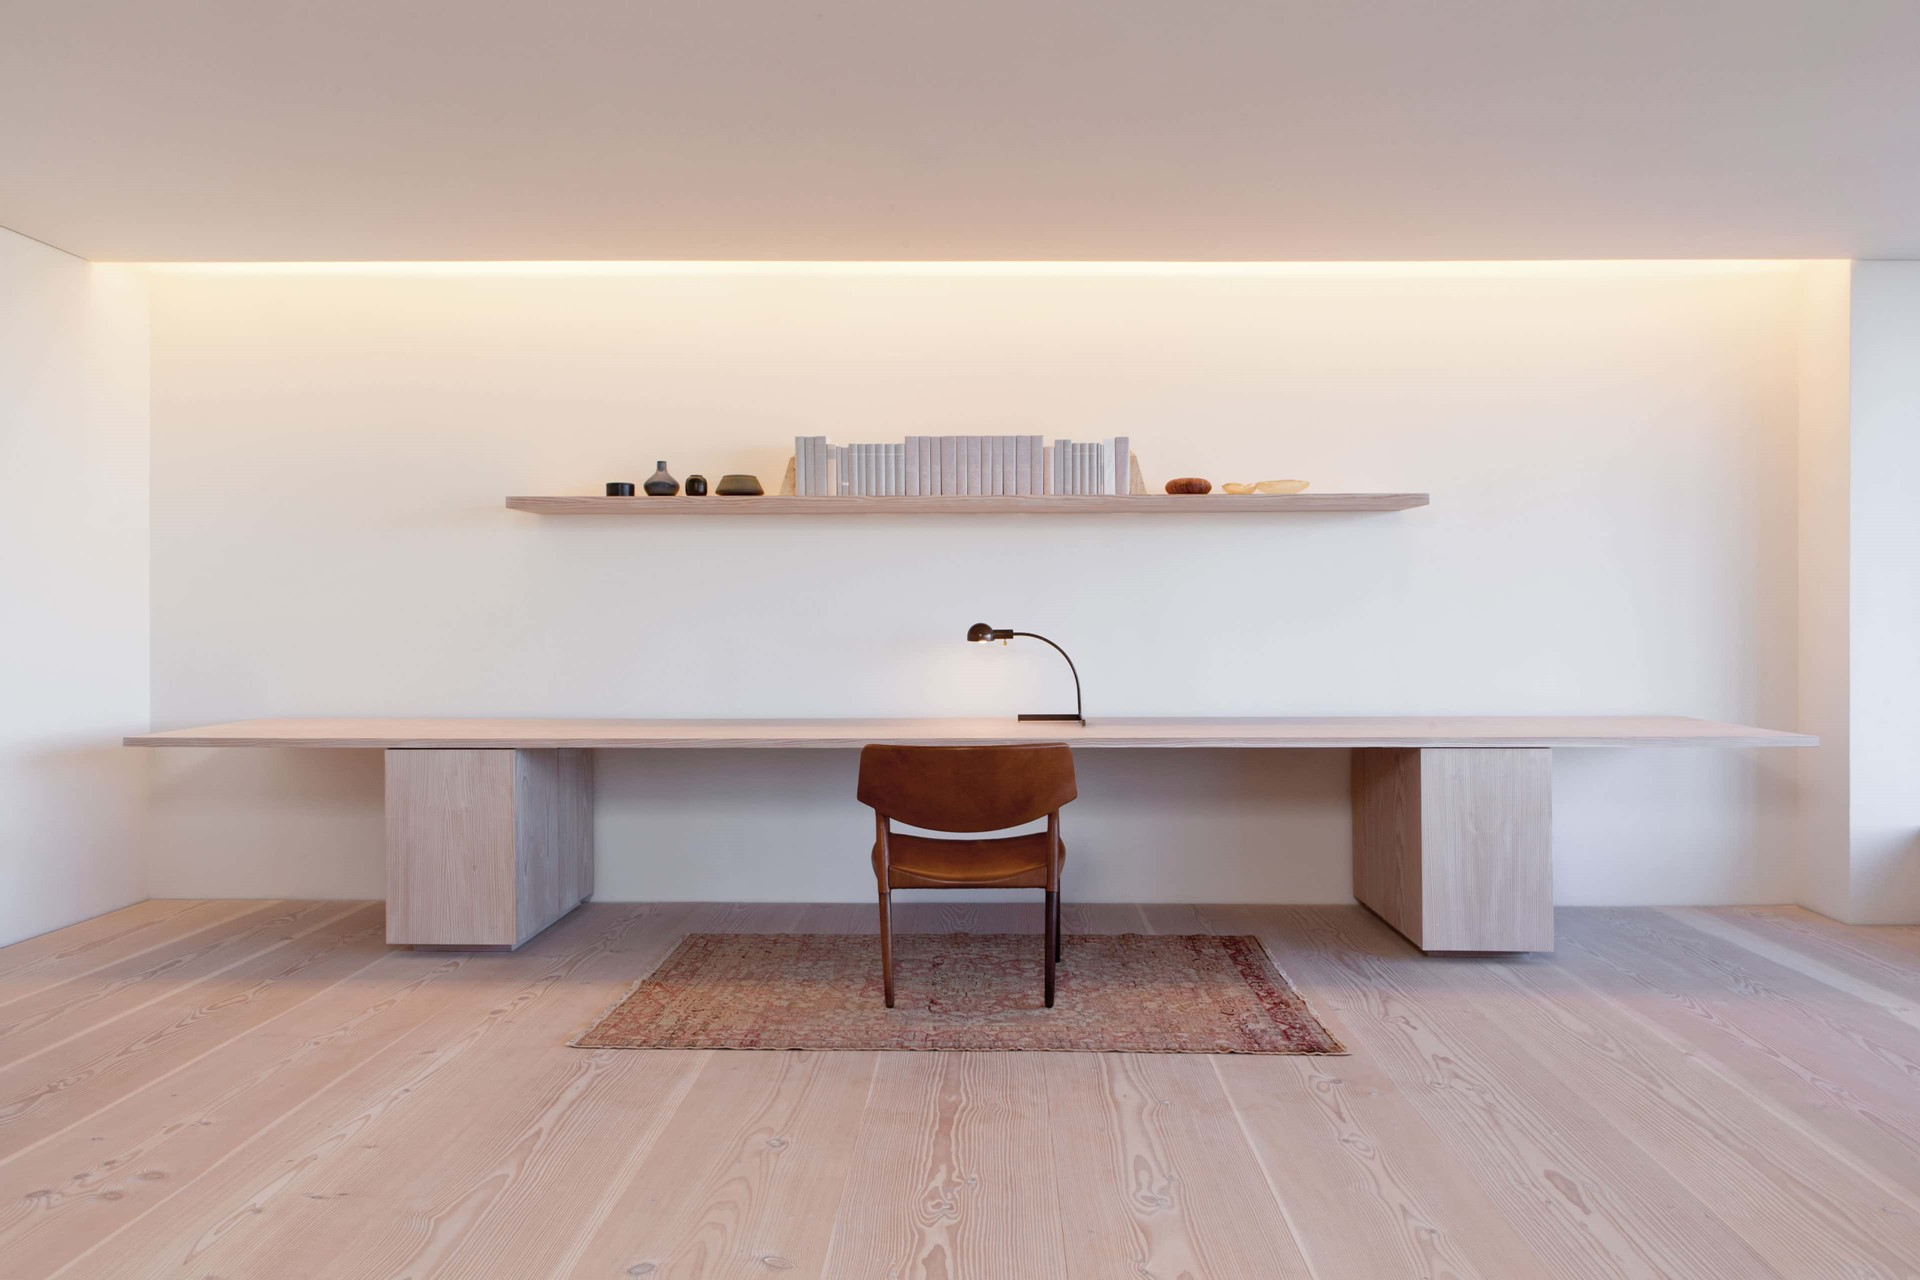 douglas-flooring_lye-and-white-soap_central-park-office_wooden-work-space_dinesen.jpg